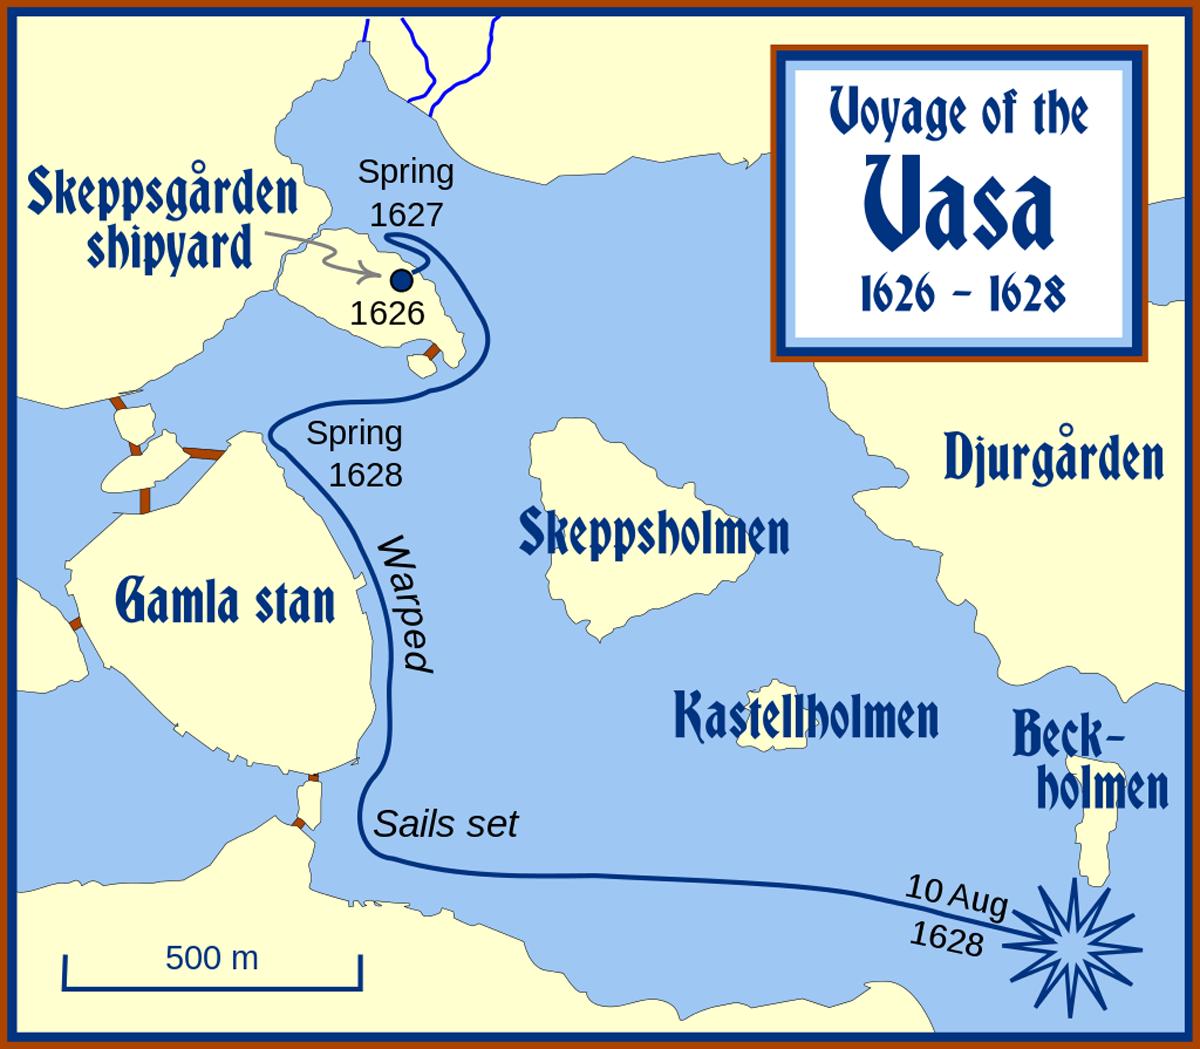 Место где затонул корабль Васа